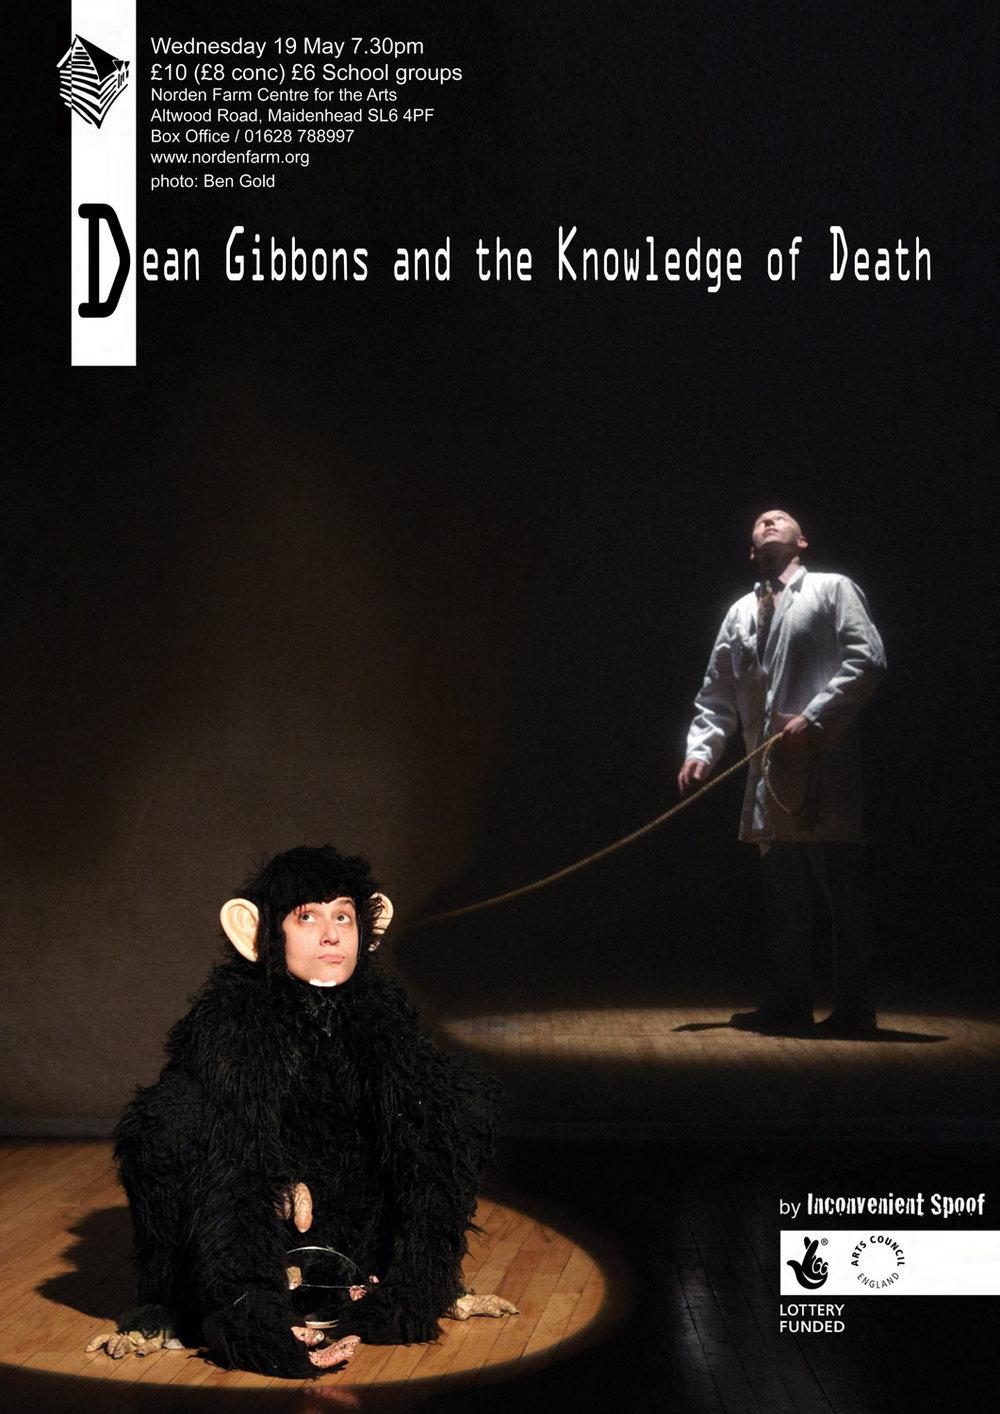 Ulysses-Black---dean-gibbons-poster.jpg